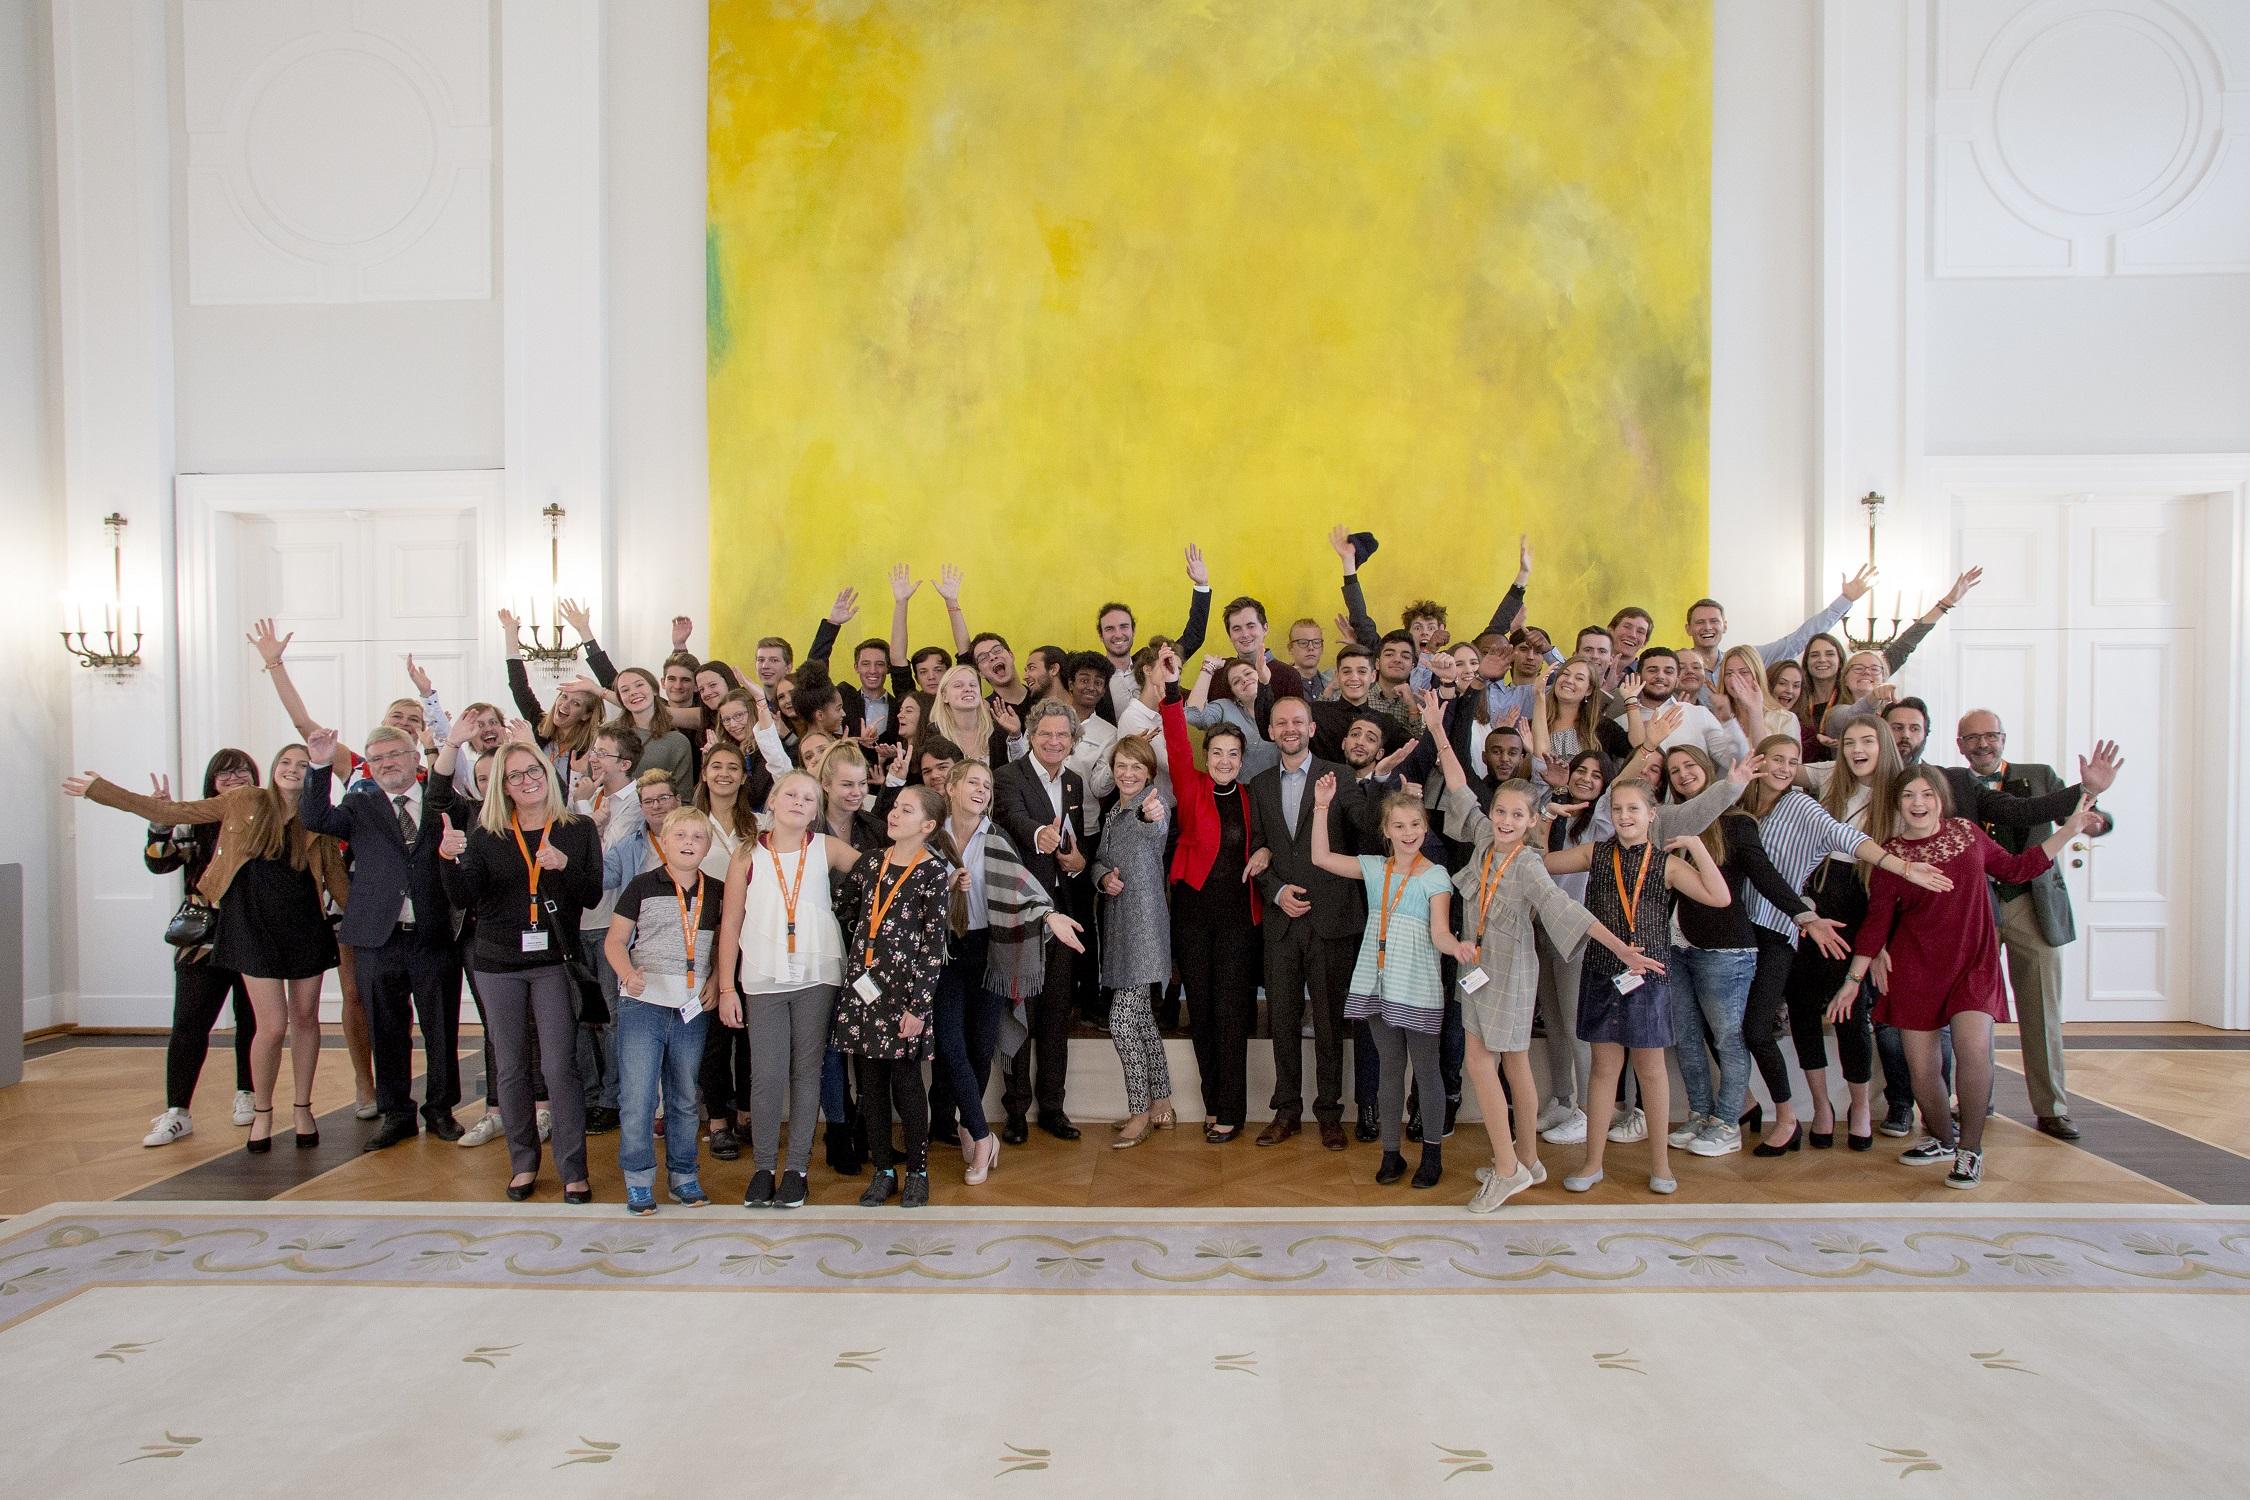 Gruppenfoto in Schloss Bellevue